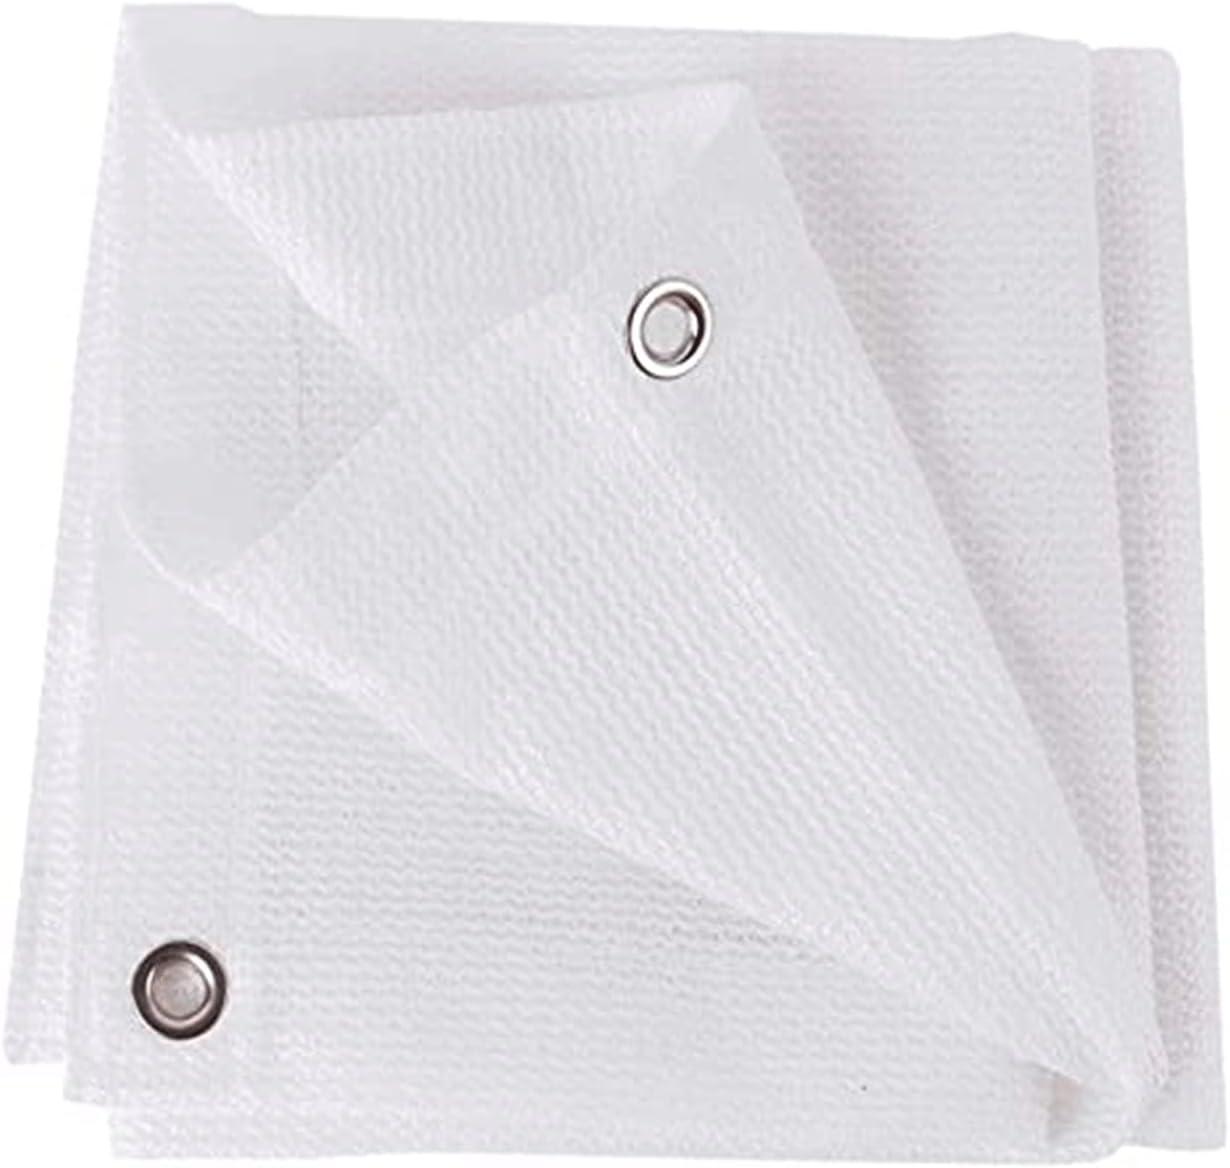 QBV Outdoor [Alternative dealer] White 80% Sun Mesh Virginia Beach Mall Sunblock Shade Cloth with Grommet